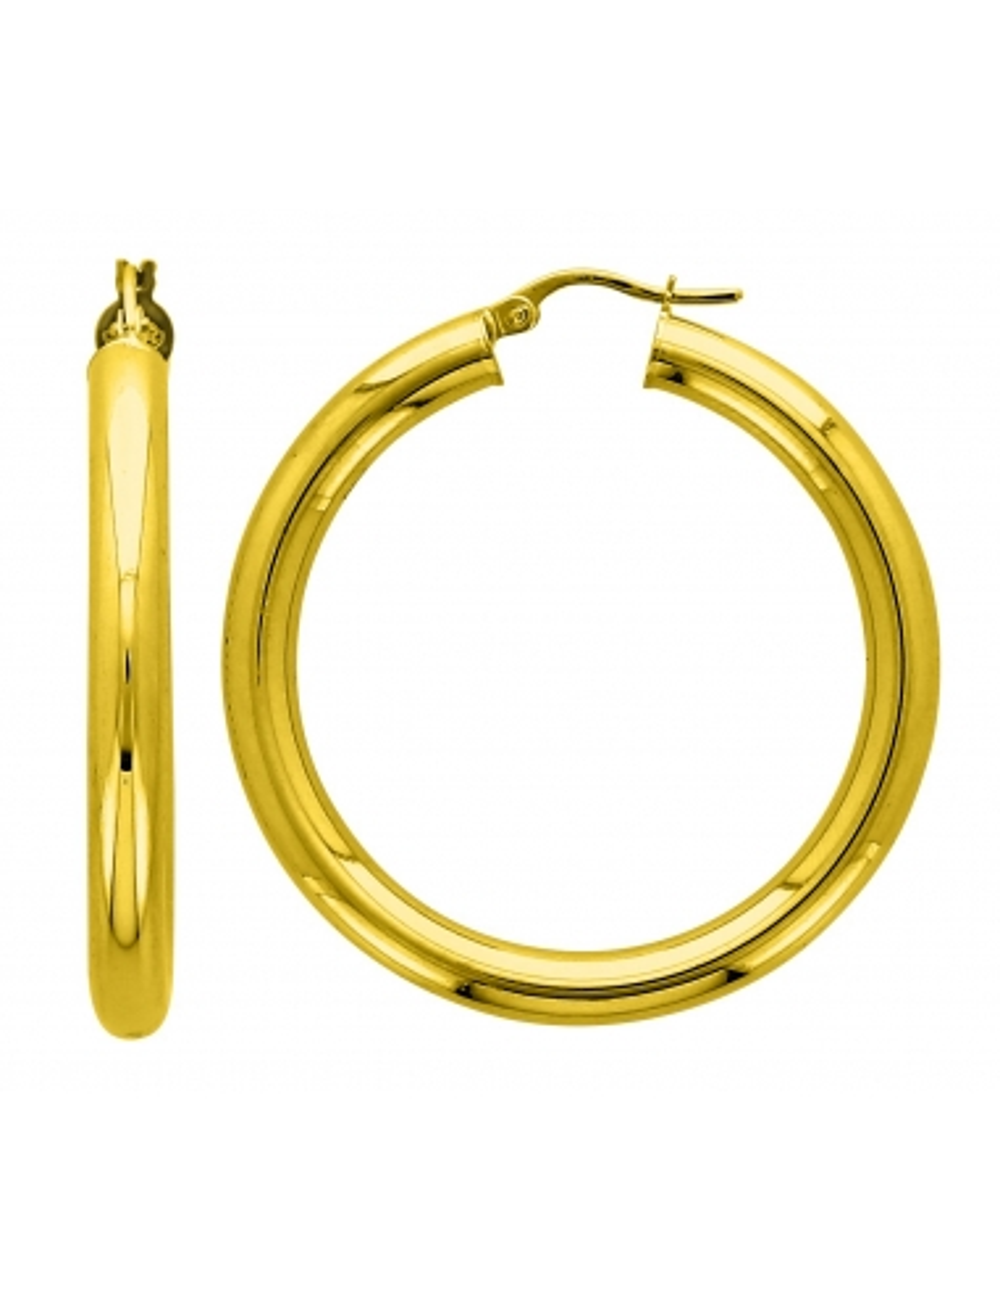 Boucle d'Oreille Or 18 carats